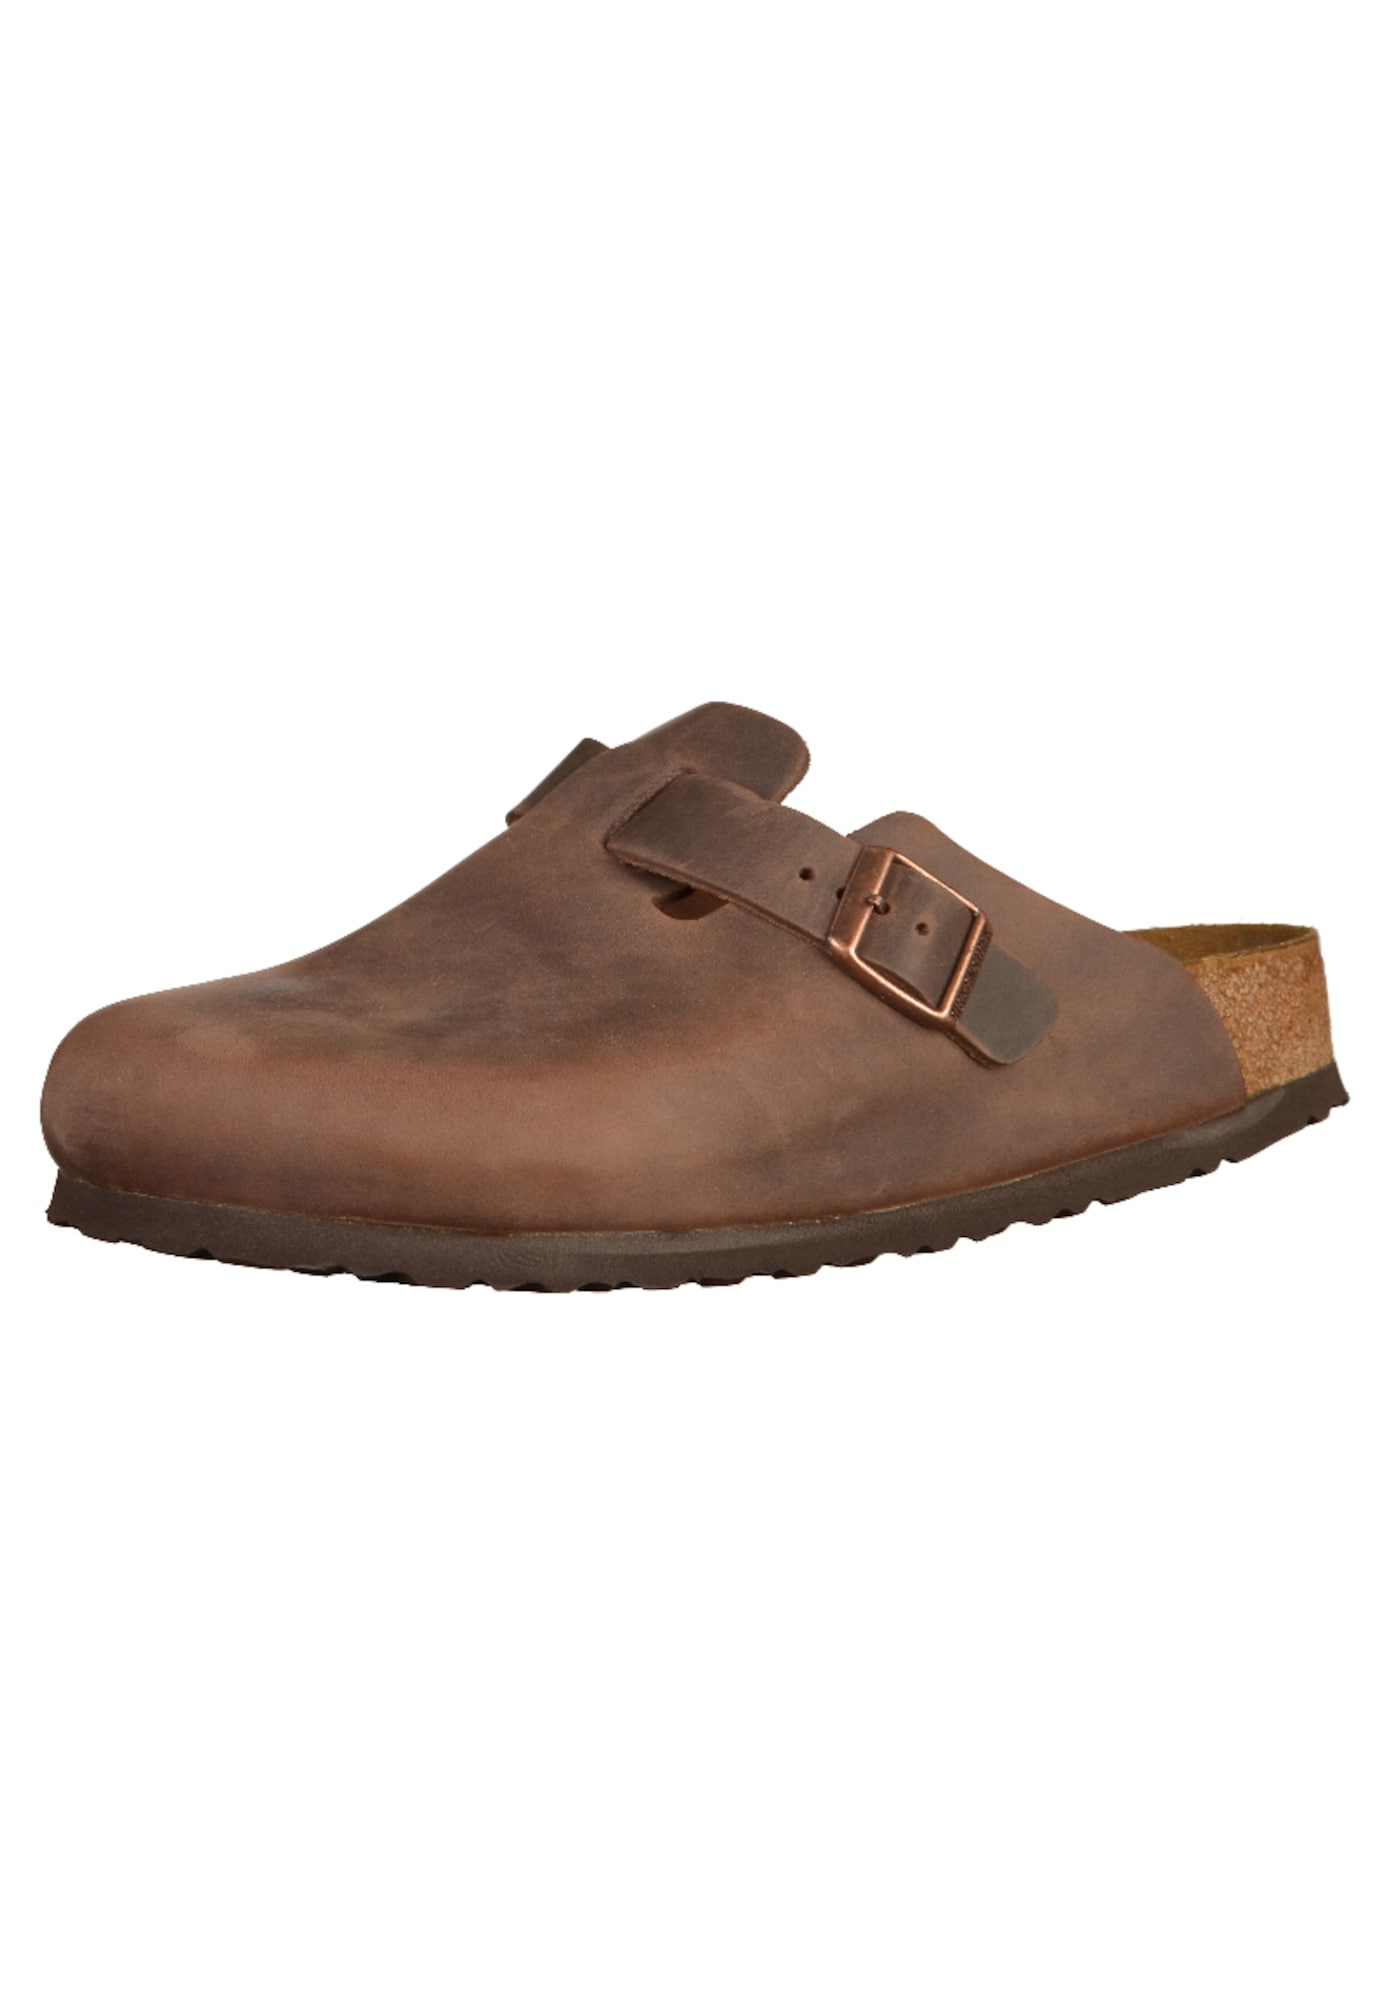 Clogs 'Boston' | Schuhe > Clogs & Pantoletten > Clogs | Birkenstock